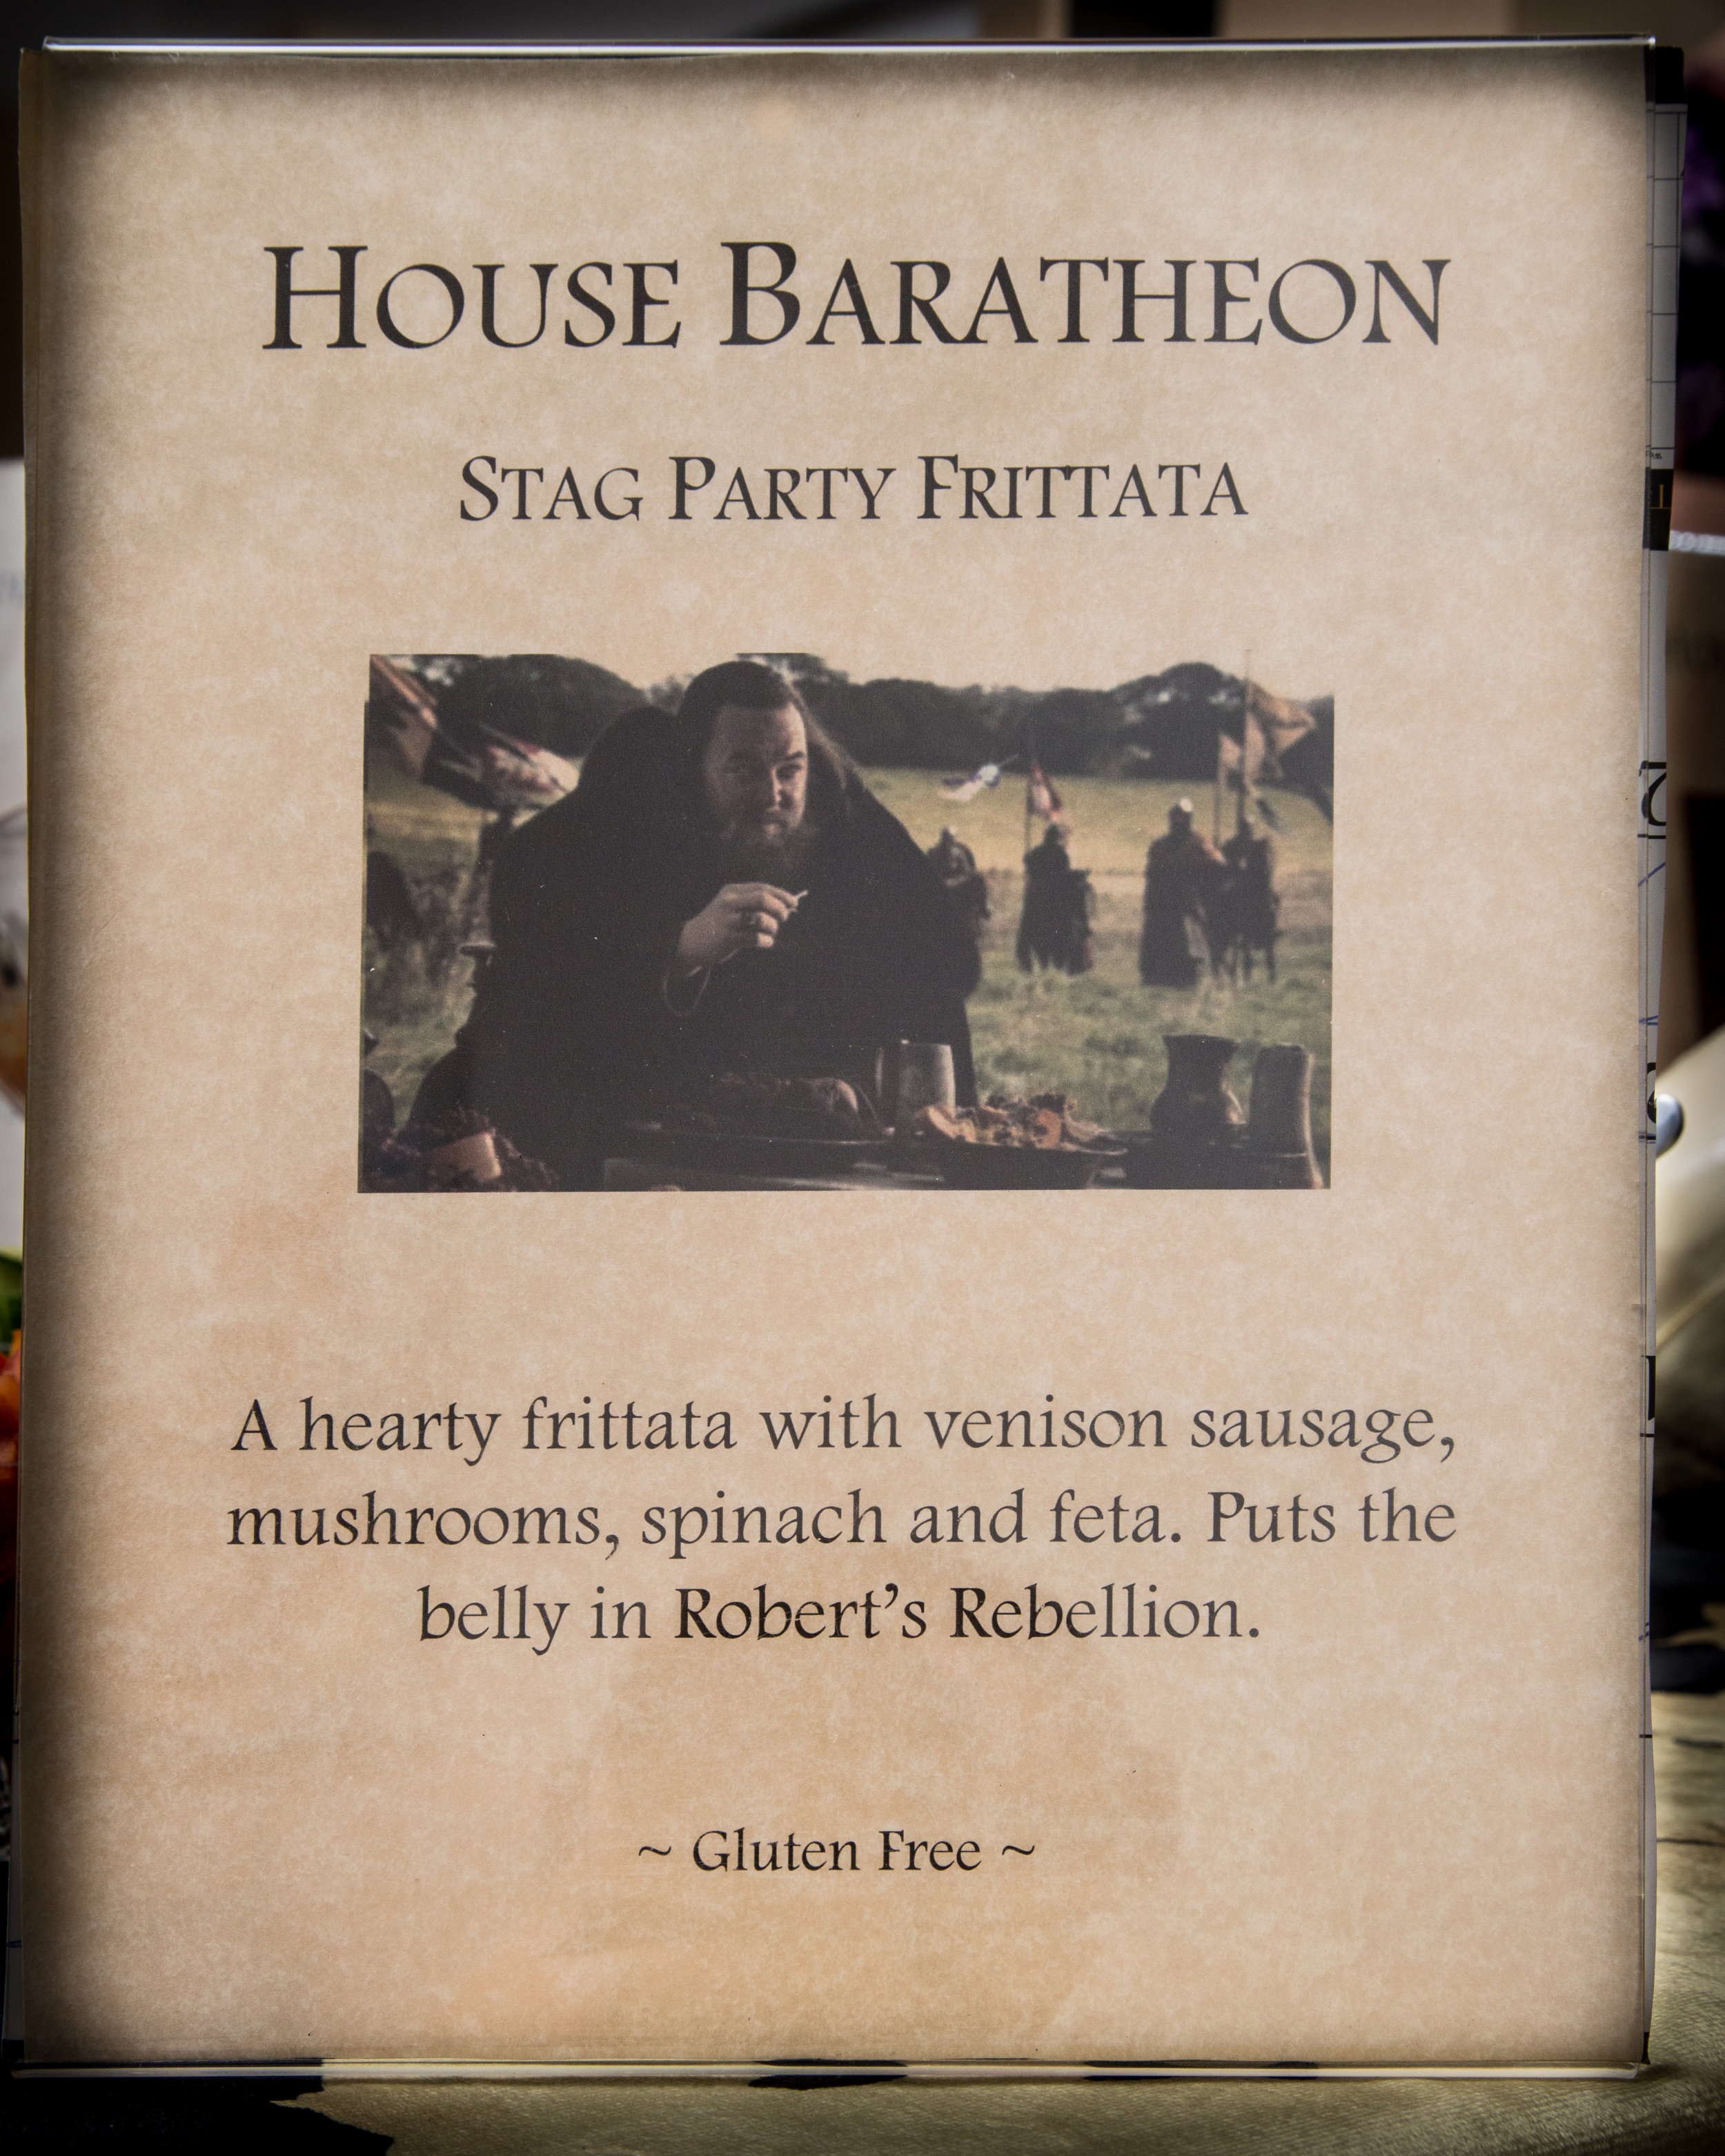 Baratheon Stag Party Frittata.jpg